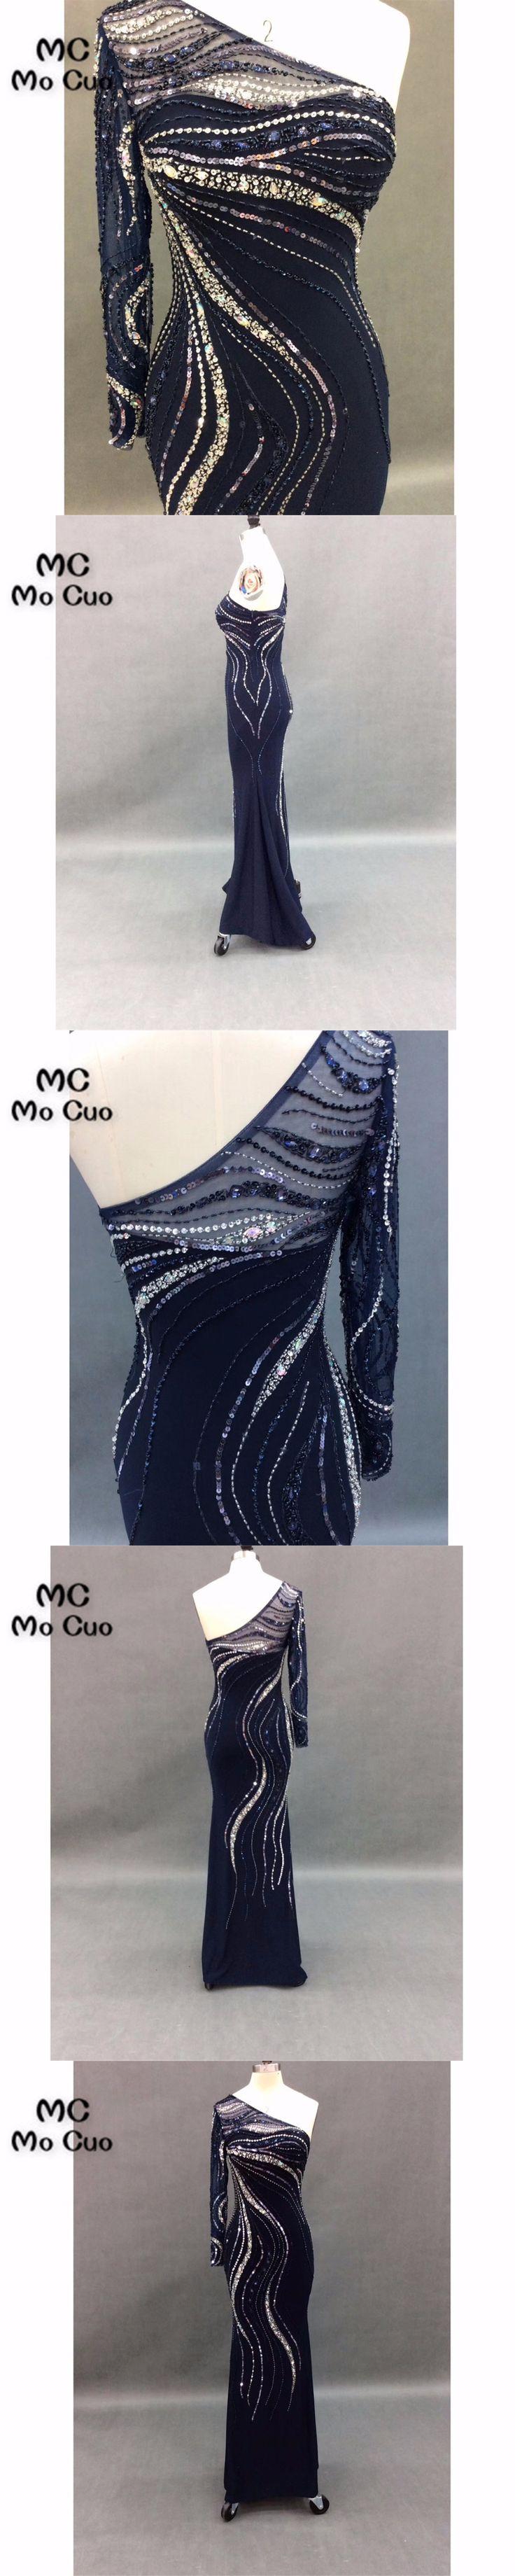 Elegant Illusion Prom Dresses for teens One shoulder Full Sleeve Beads Vestidos de fiesta Mermaid Formal Evening Dress 100% Real